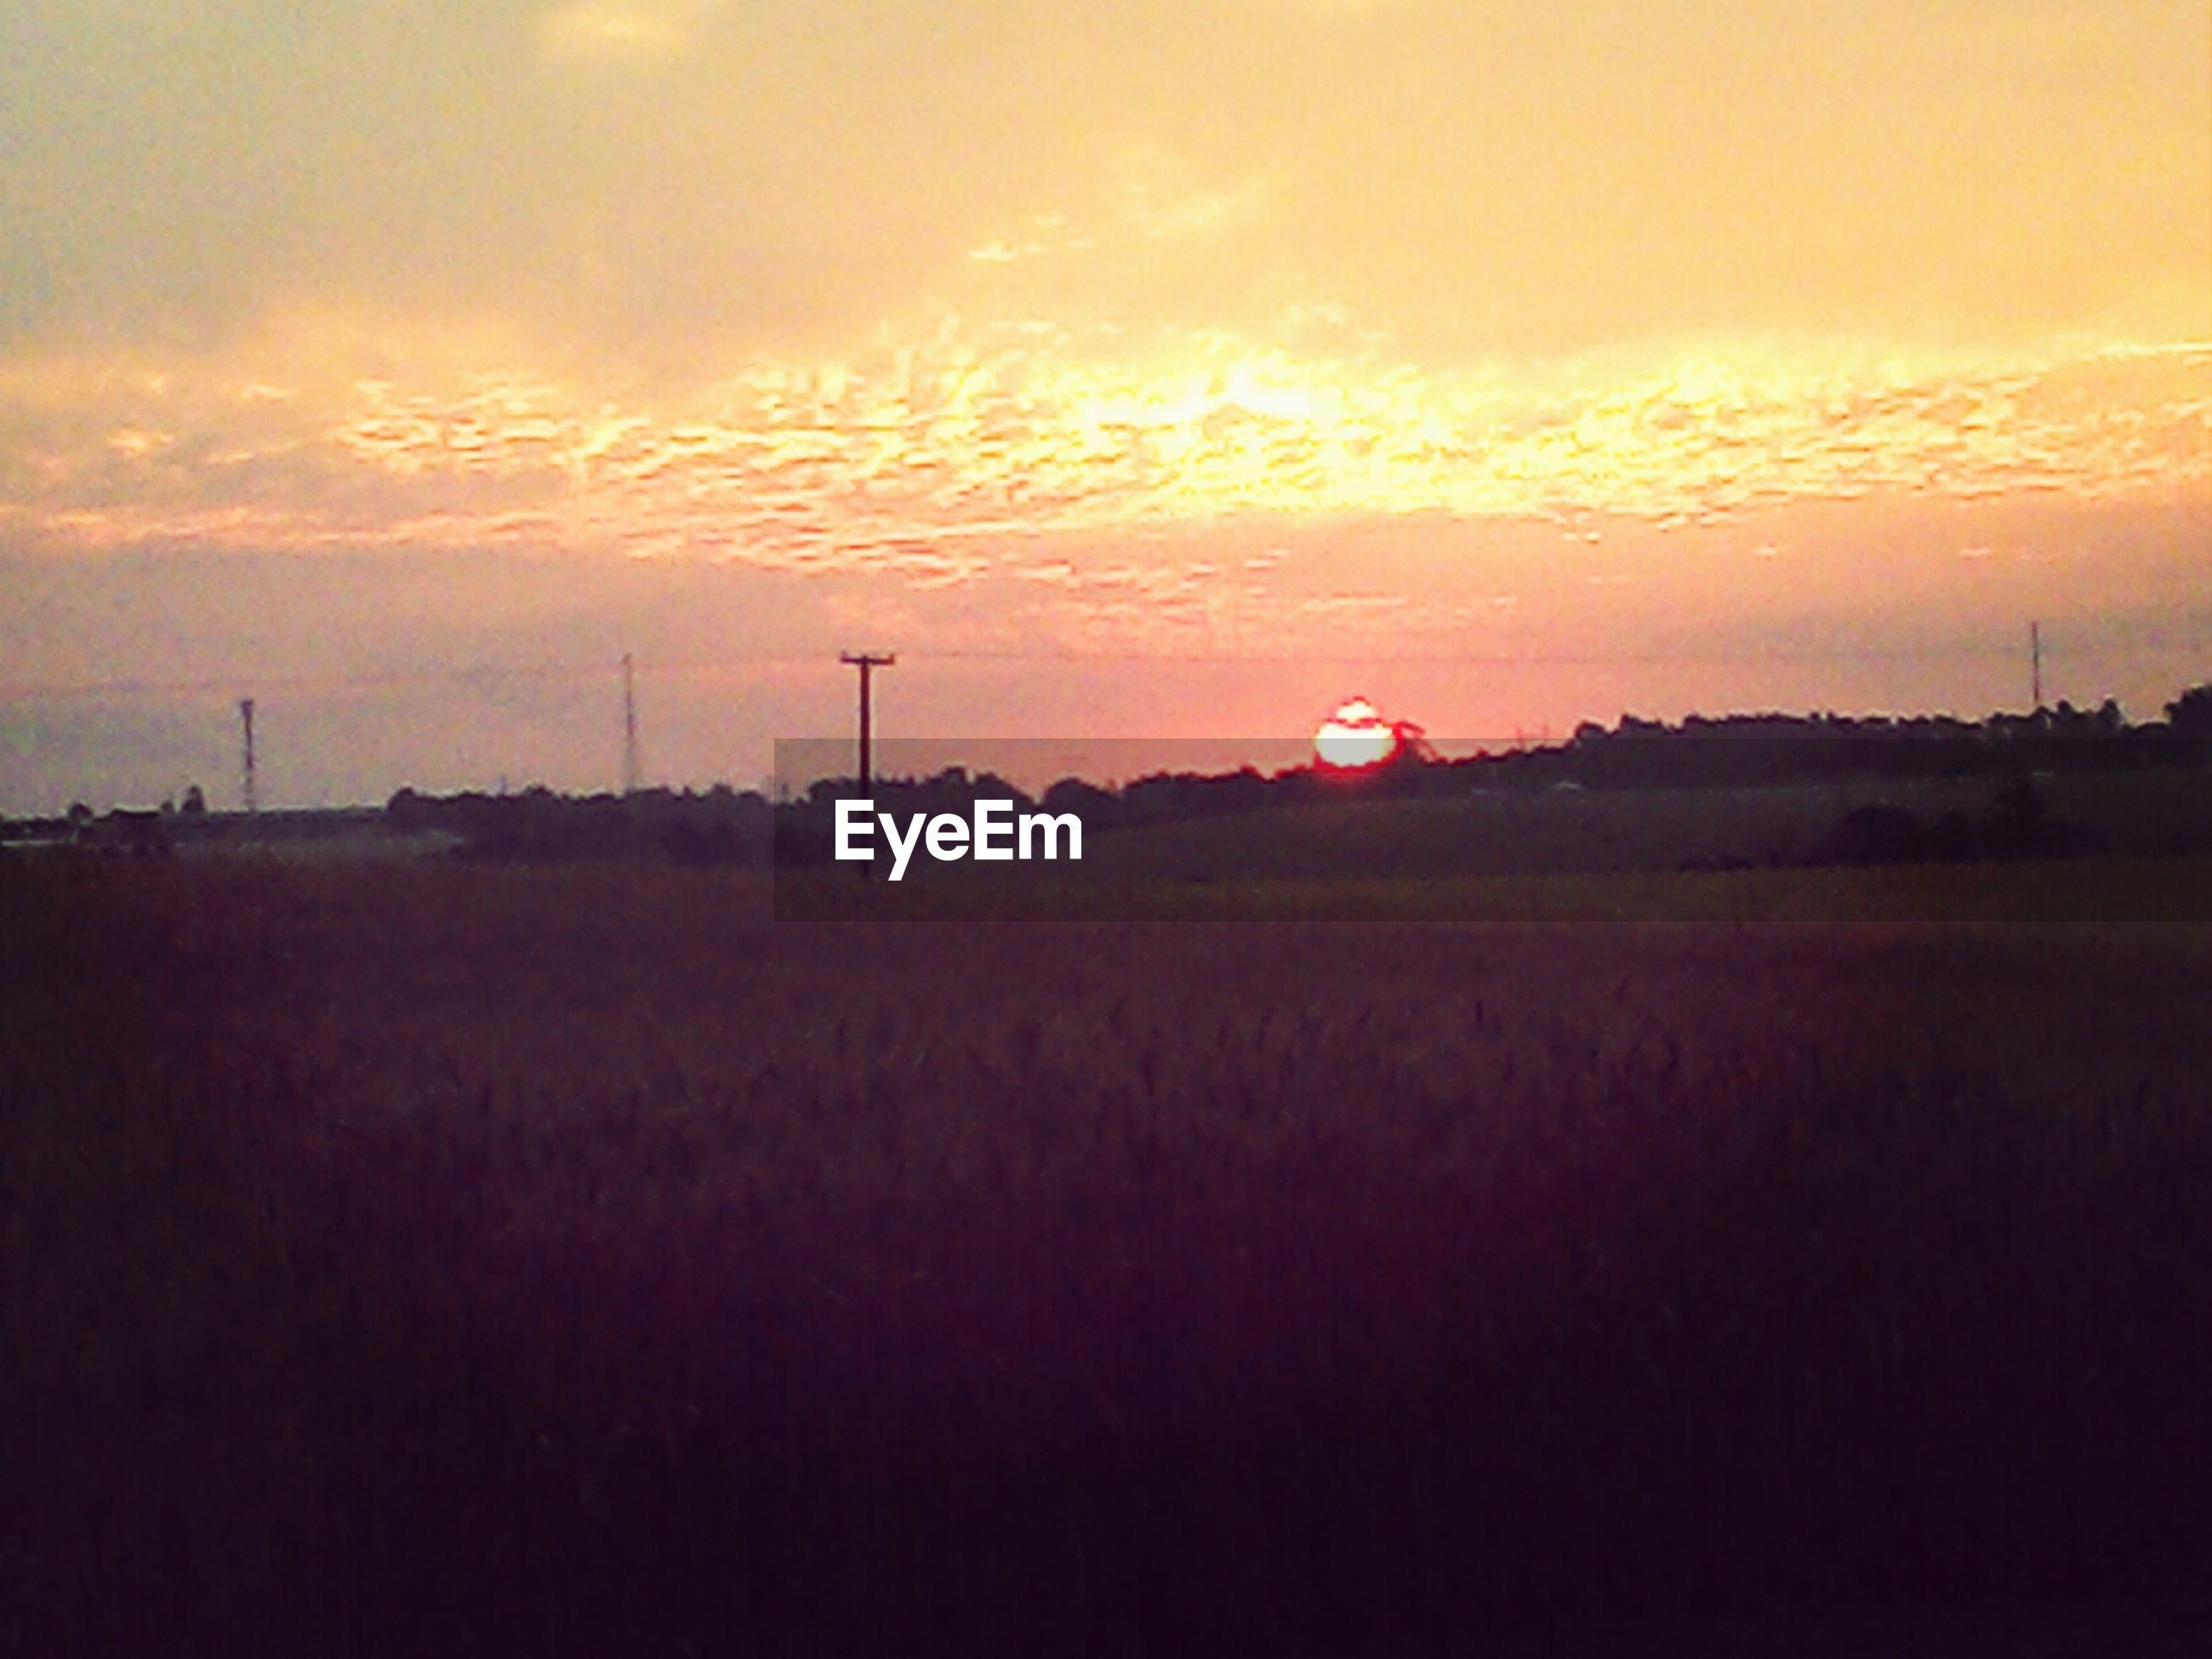 sunset, landscape, sky, field, tranquil scene, scenics, tranquility, beauty in nature, orange color, silhouette, rural scene, cloud - sky, nature, idyllic, agriculture, cloud, dramatic sky, farm, dusk, horizon over land